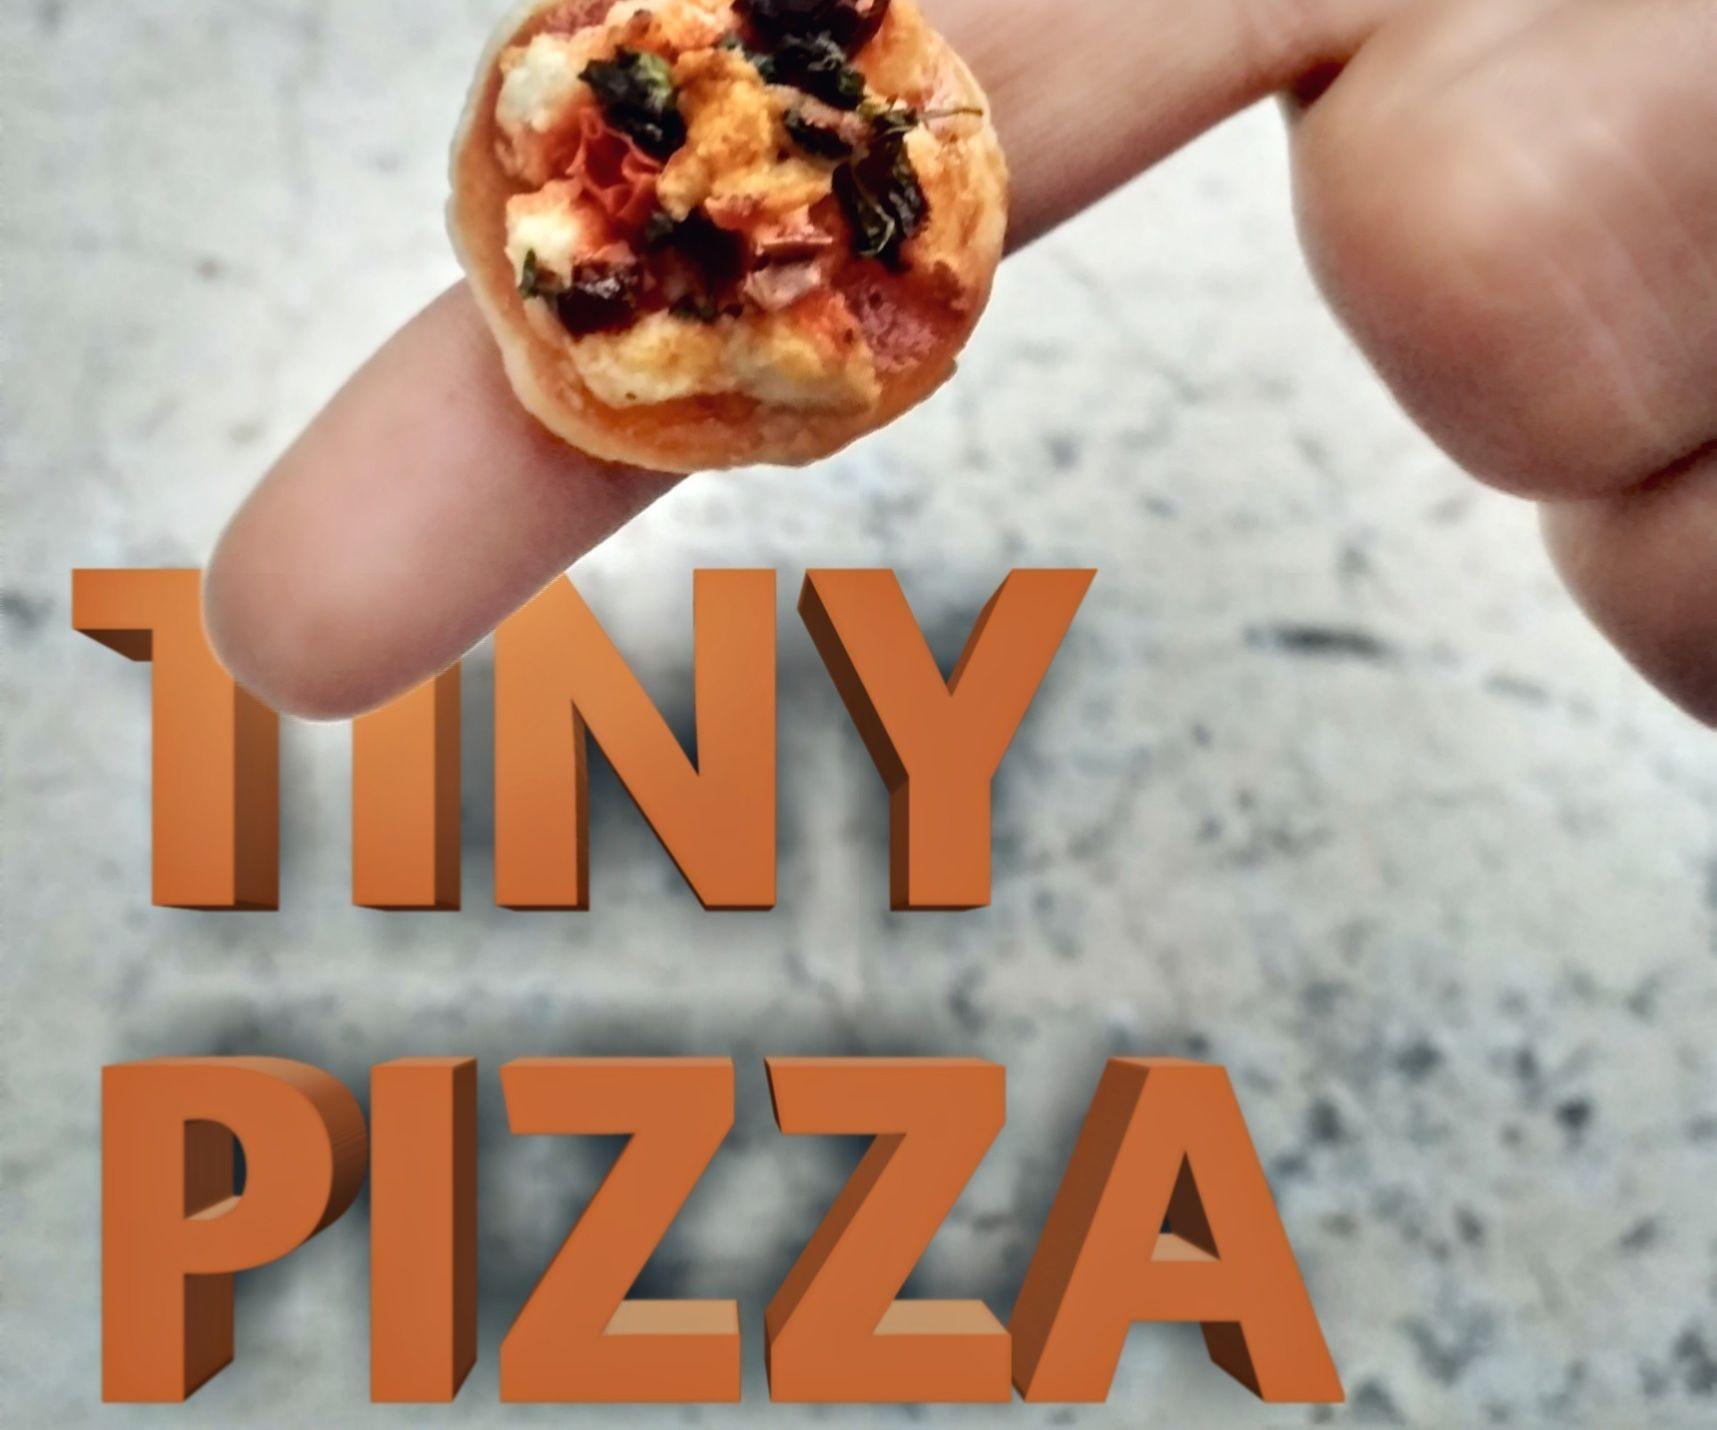 TINY PIZZA 😋    Cute Smallest Pizza